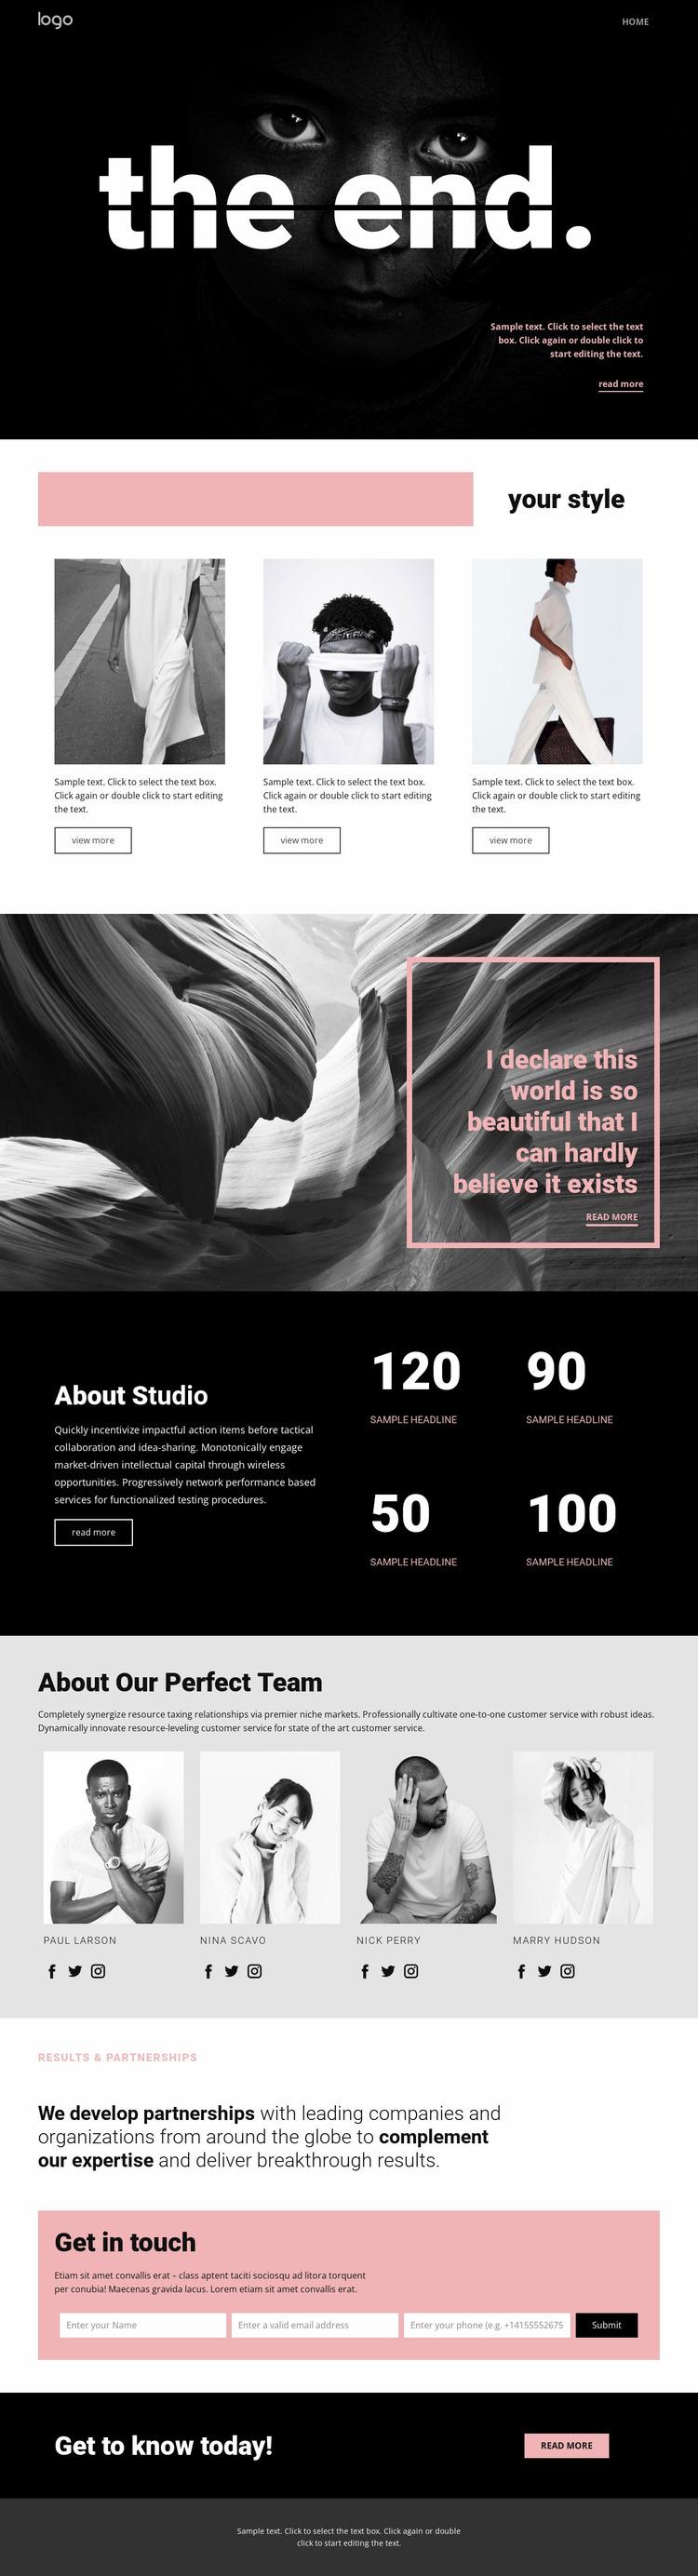 Perfecting styles of art Website Mockup